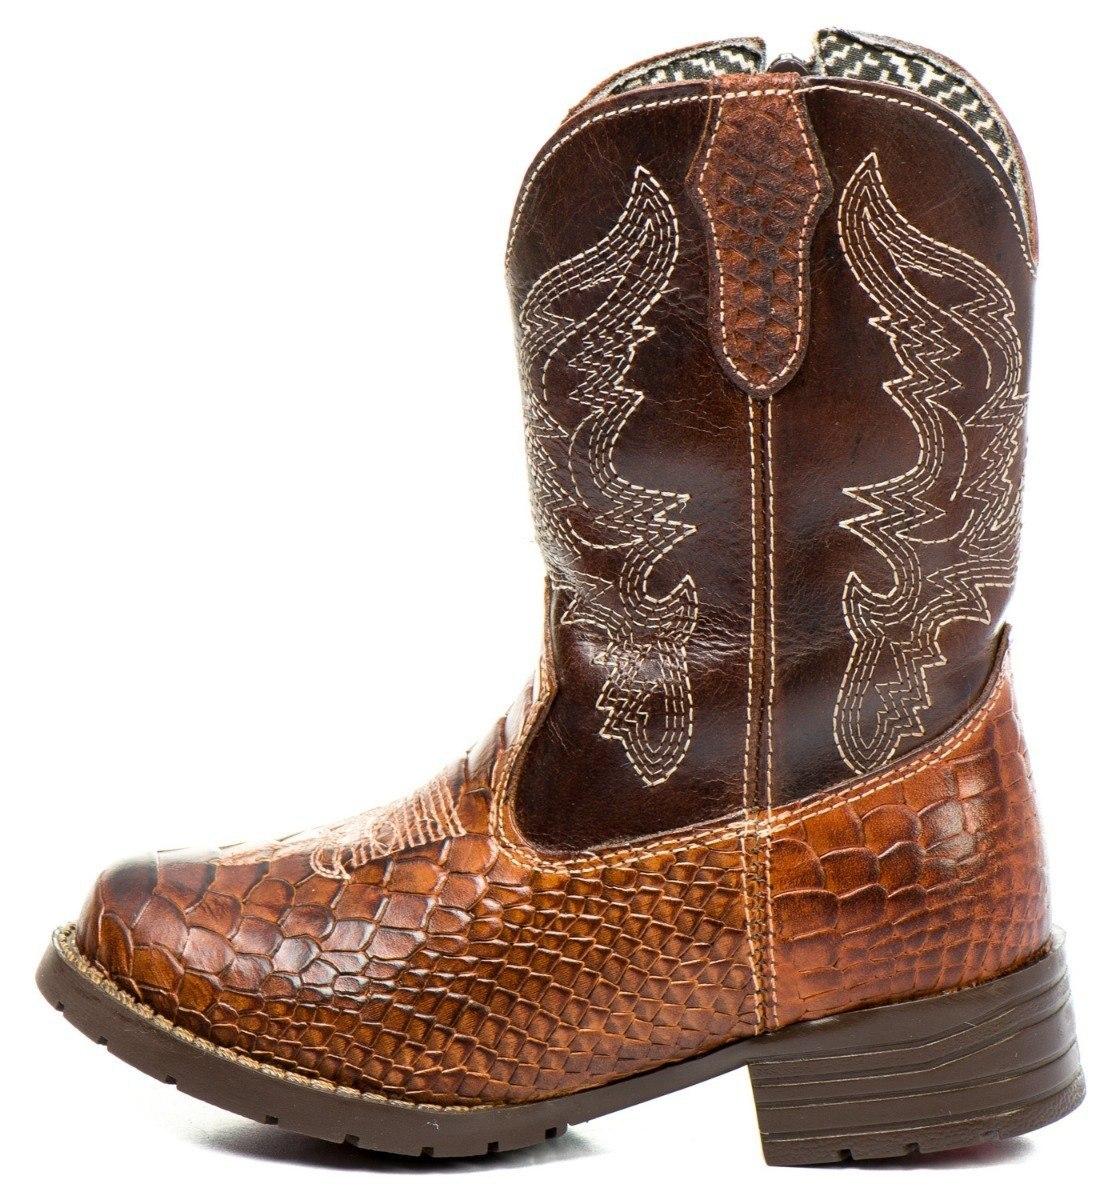 a40f7a6619 bota country masculina texana americana couro cano longo inf. Carregando  zoom.